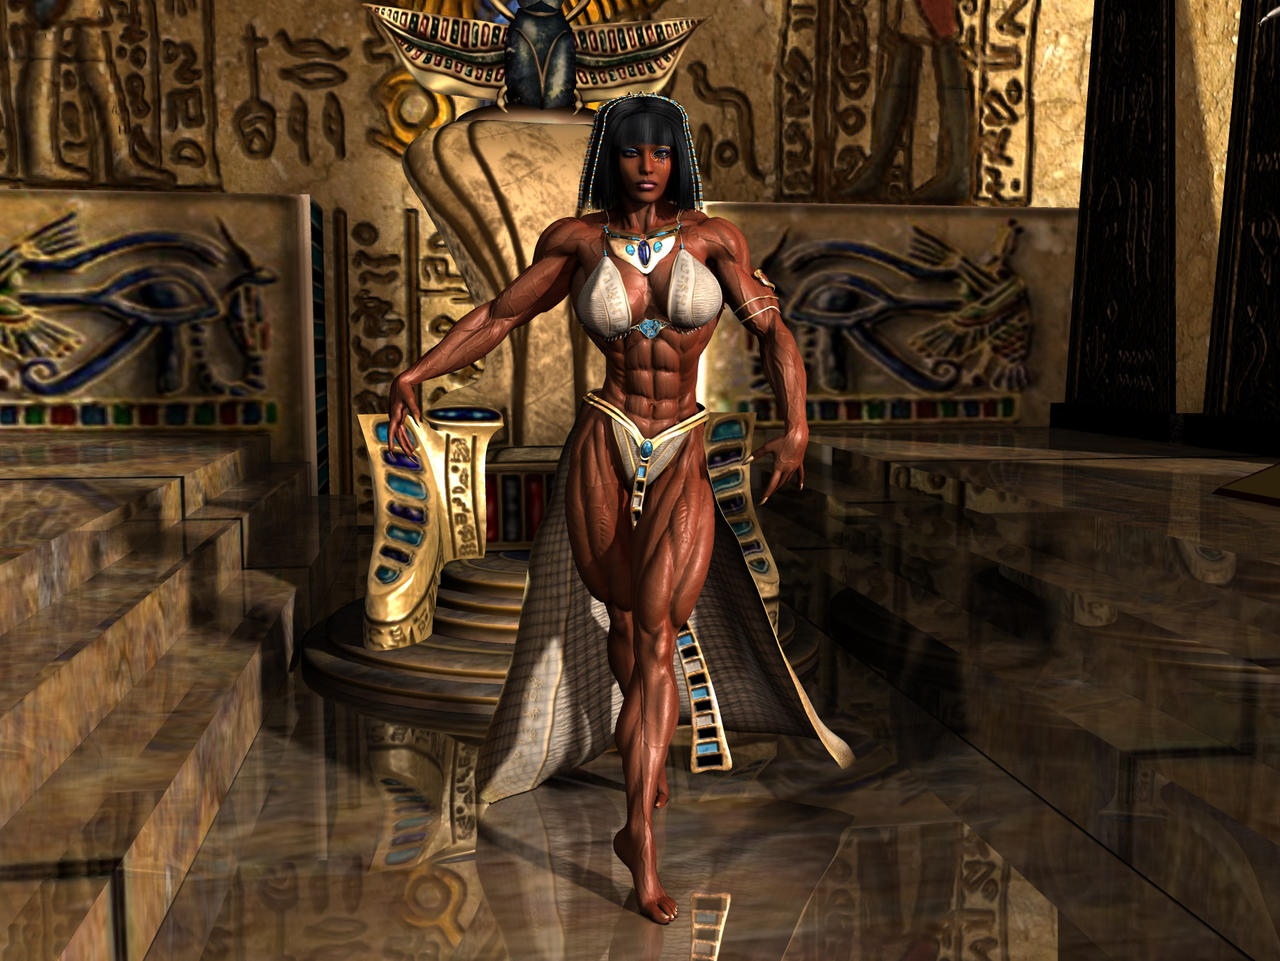 Nefertete by Tigersan